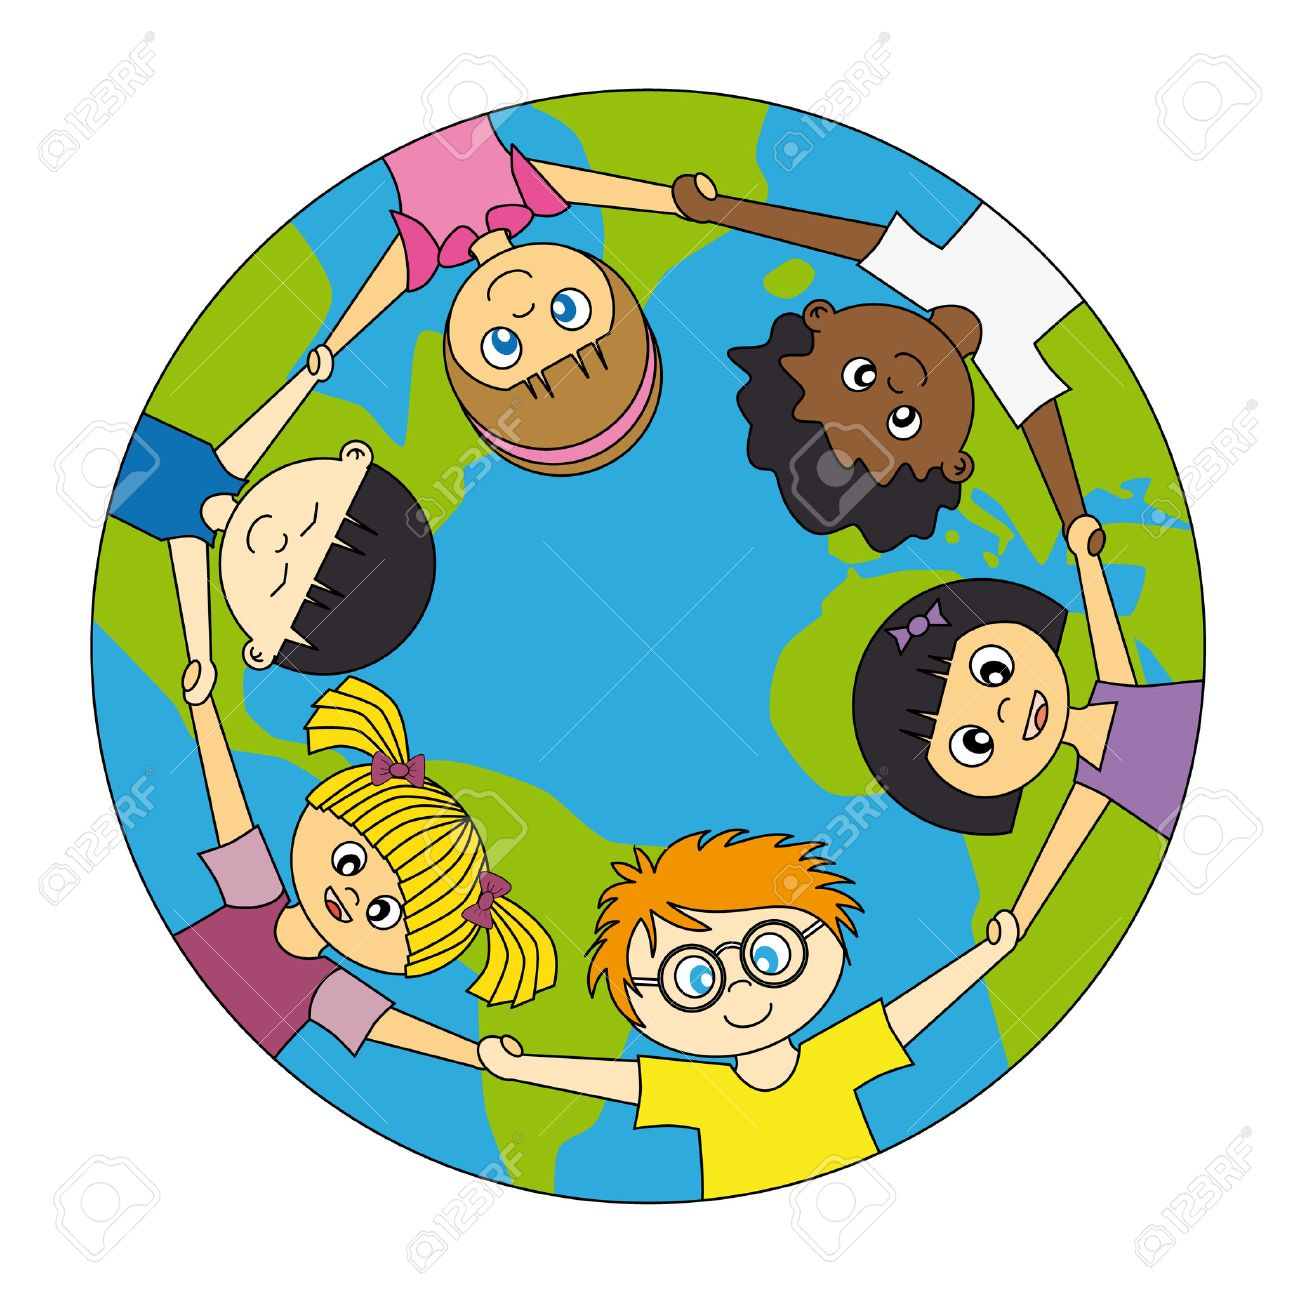 children around the world united Stock Vector - 9318906